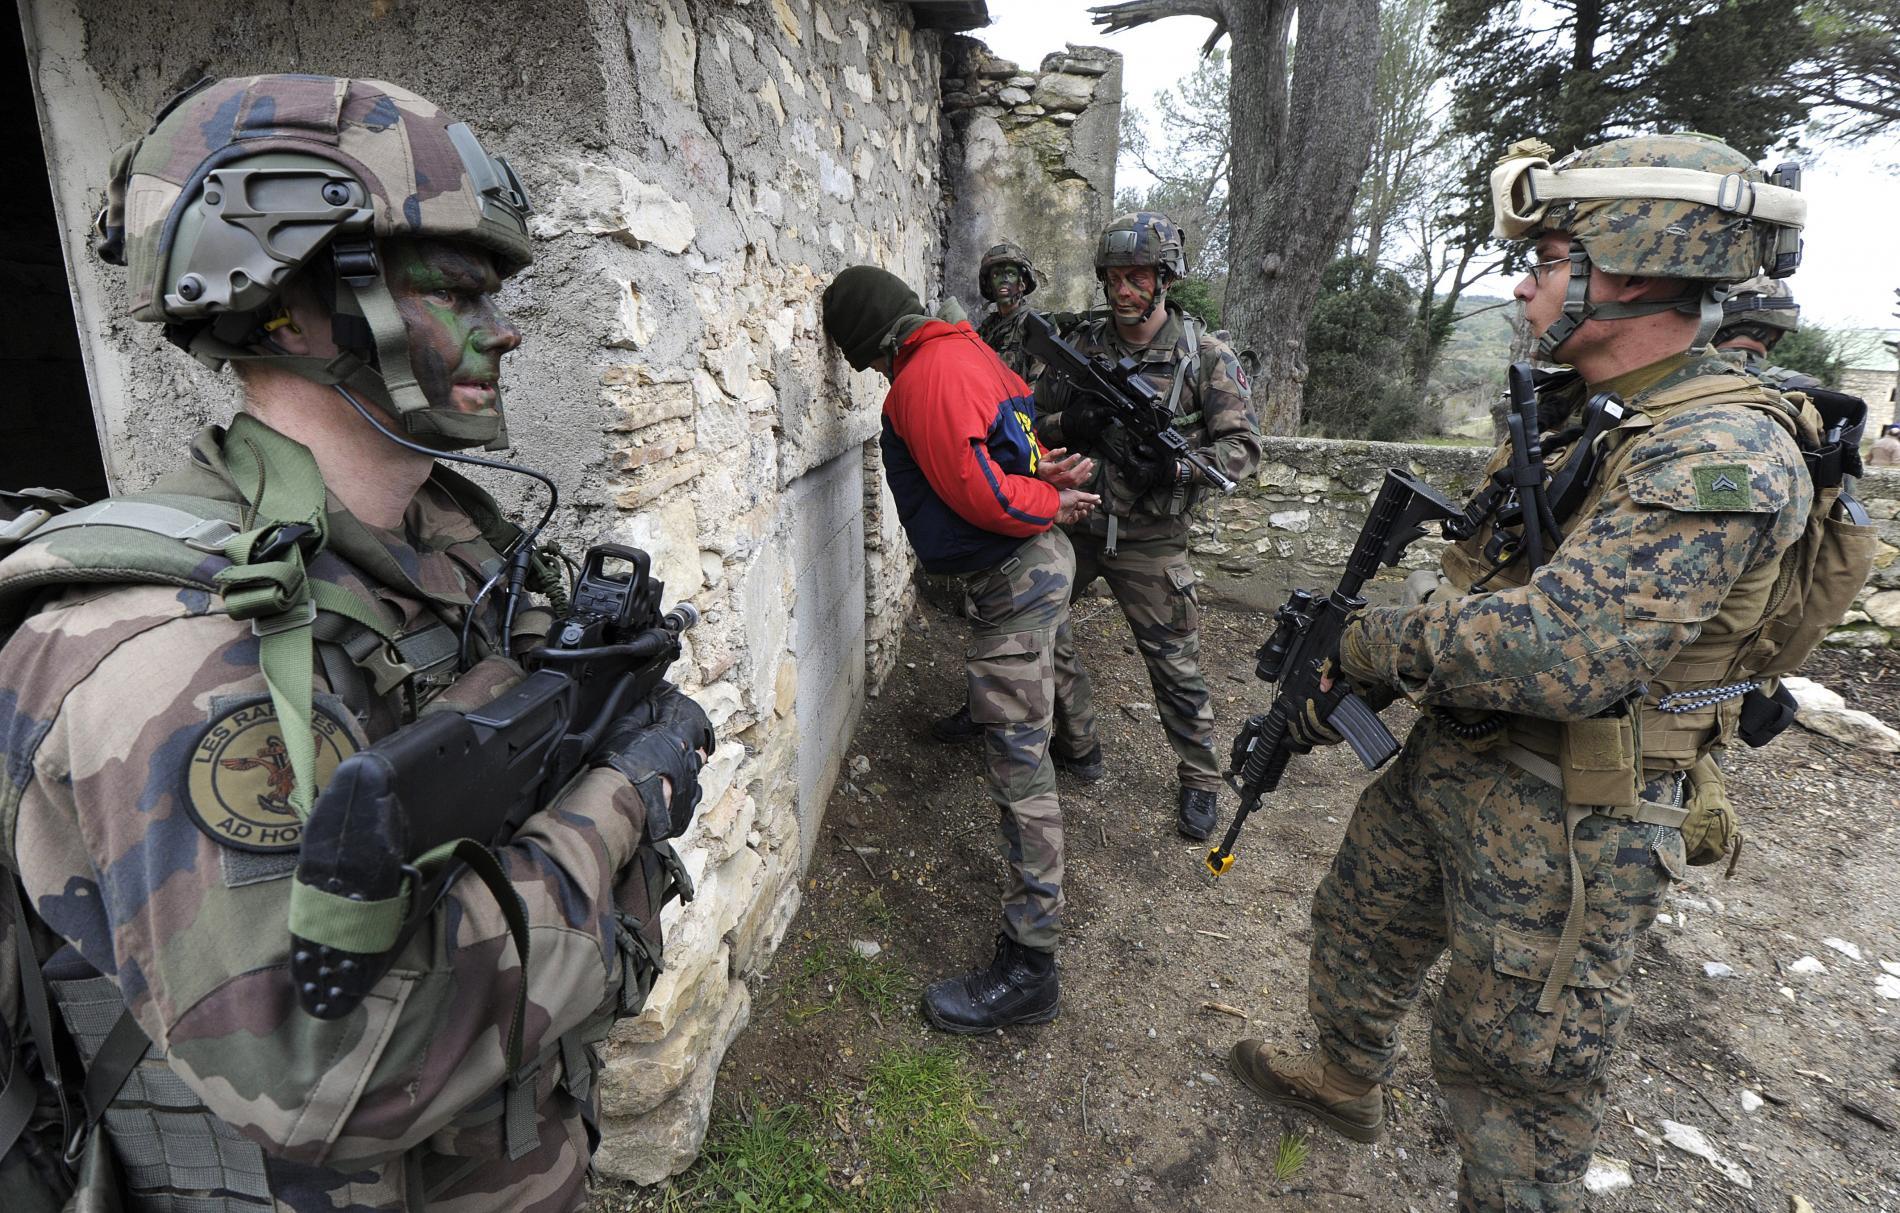 Capture de Geronimo: un exercice militaire franco